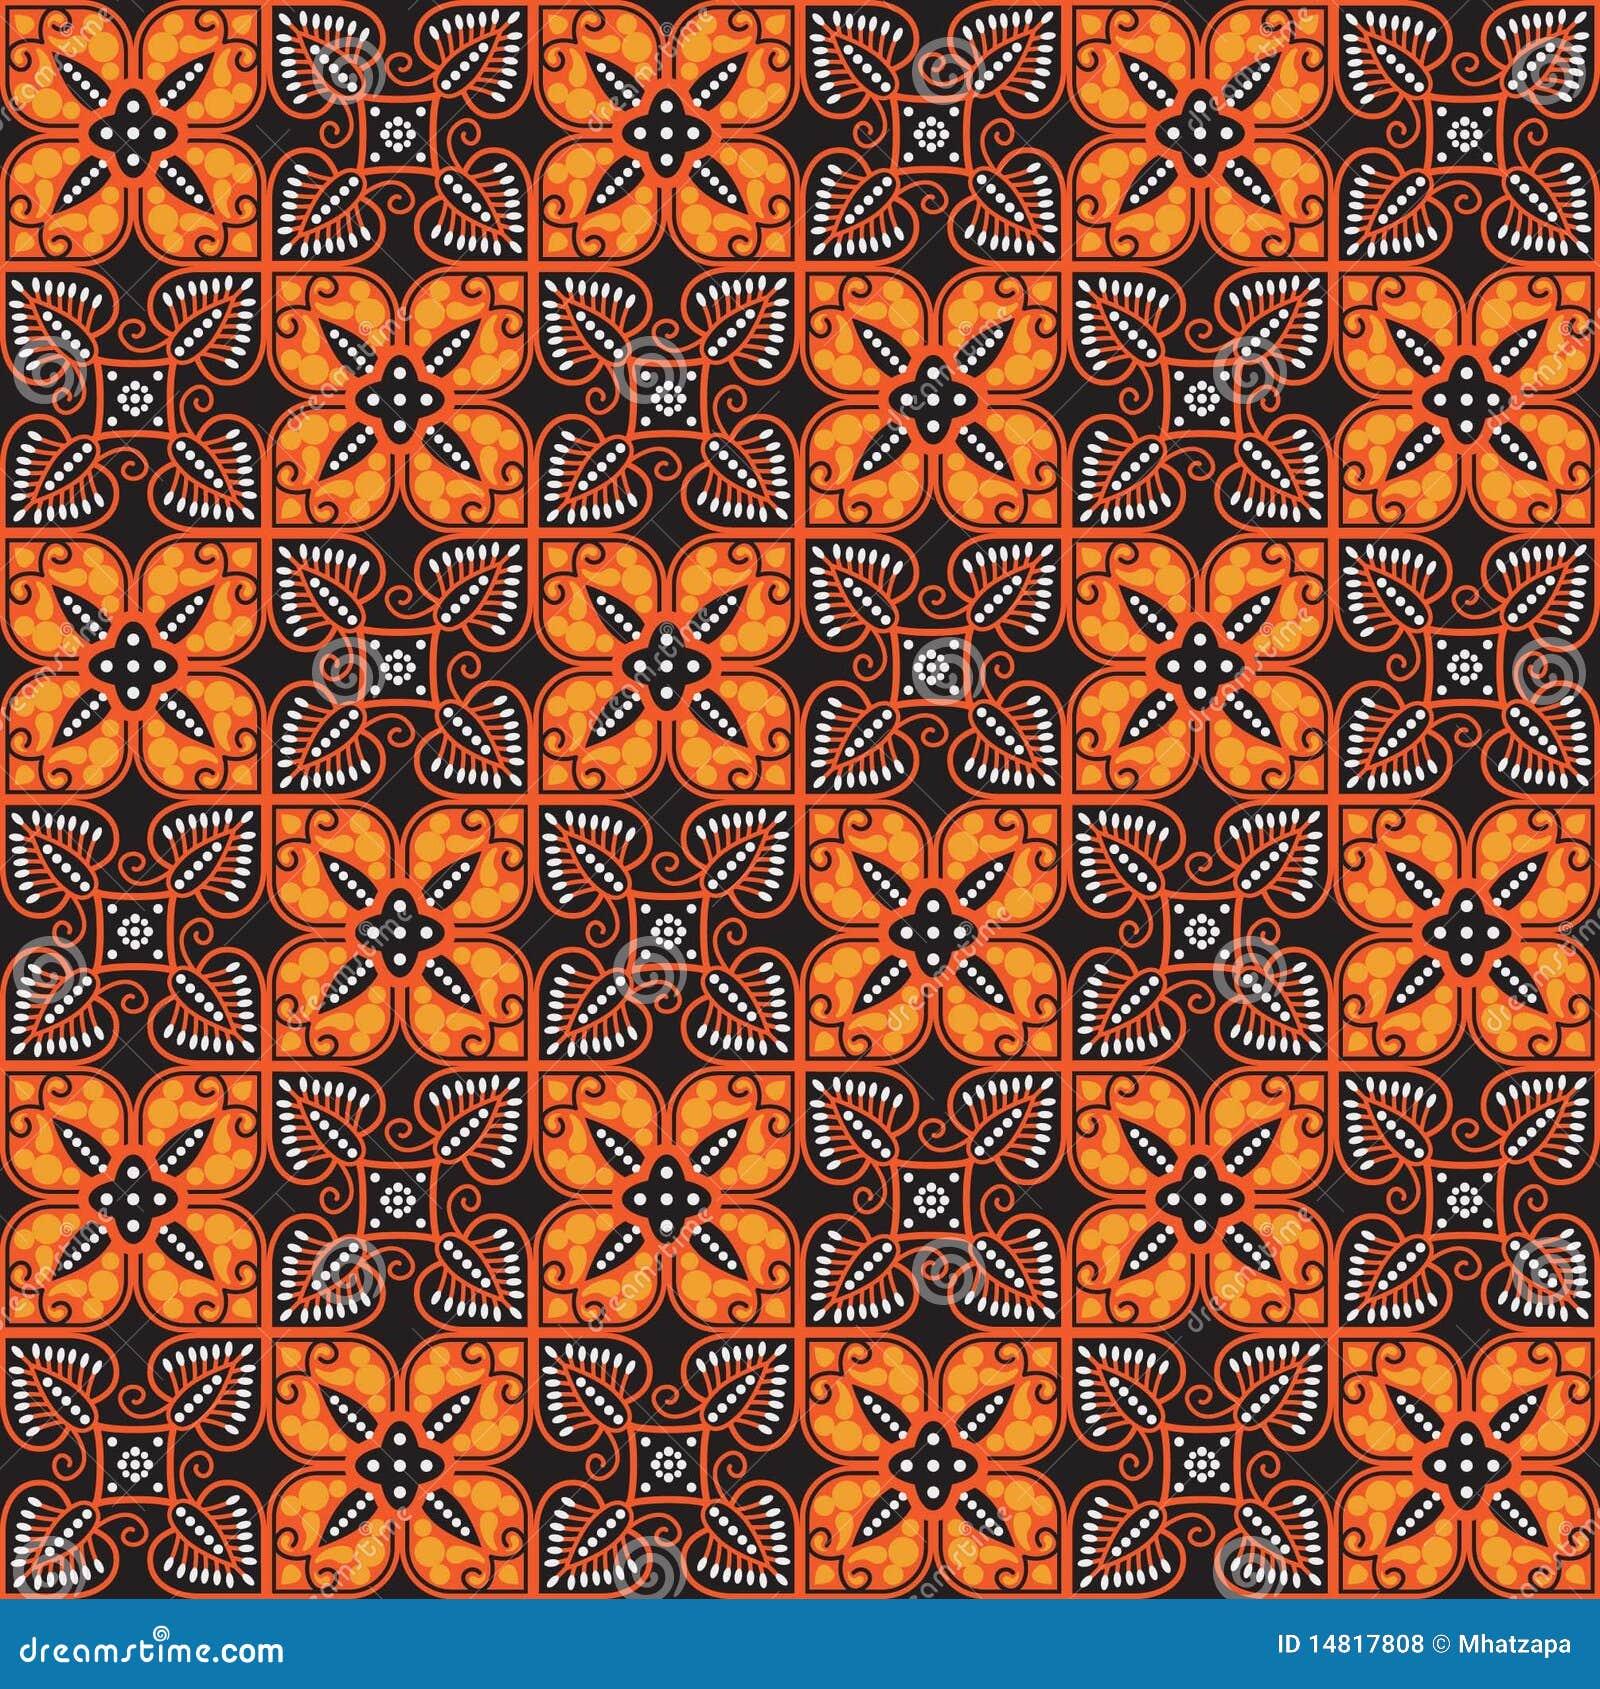 Batik Pattern Stock Vector. Illustration Of Backdrop